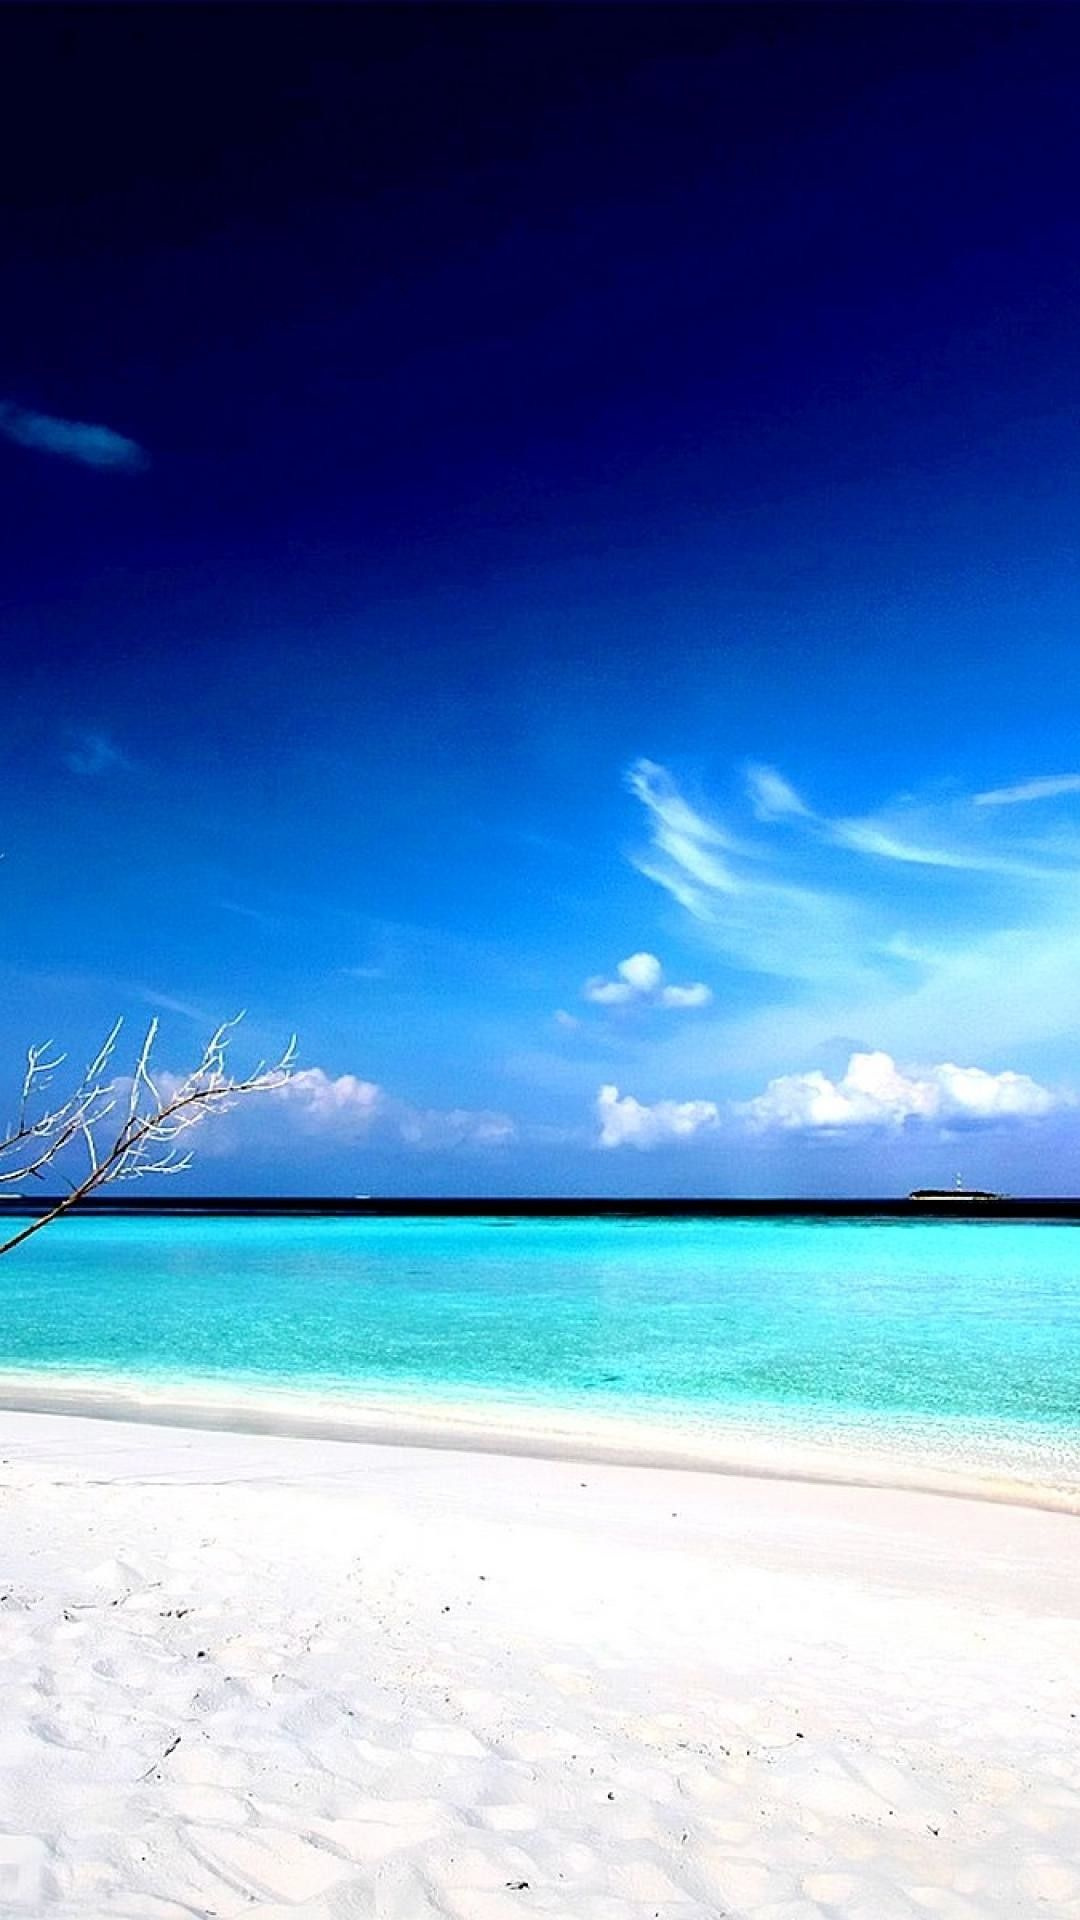 Beach Iphone Hd Wallpapers Top Free Beach Iphone Hd